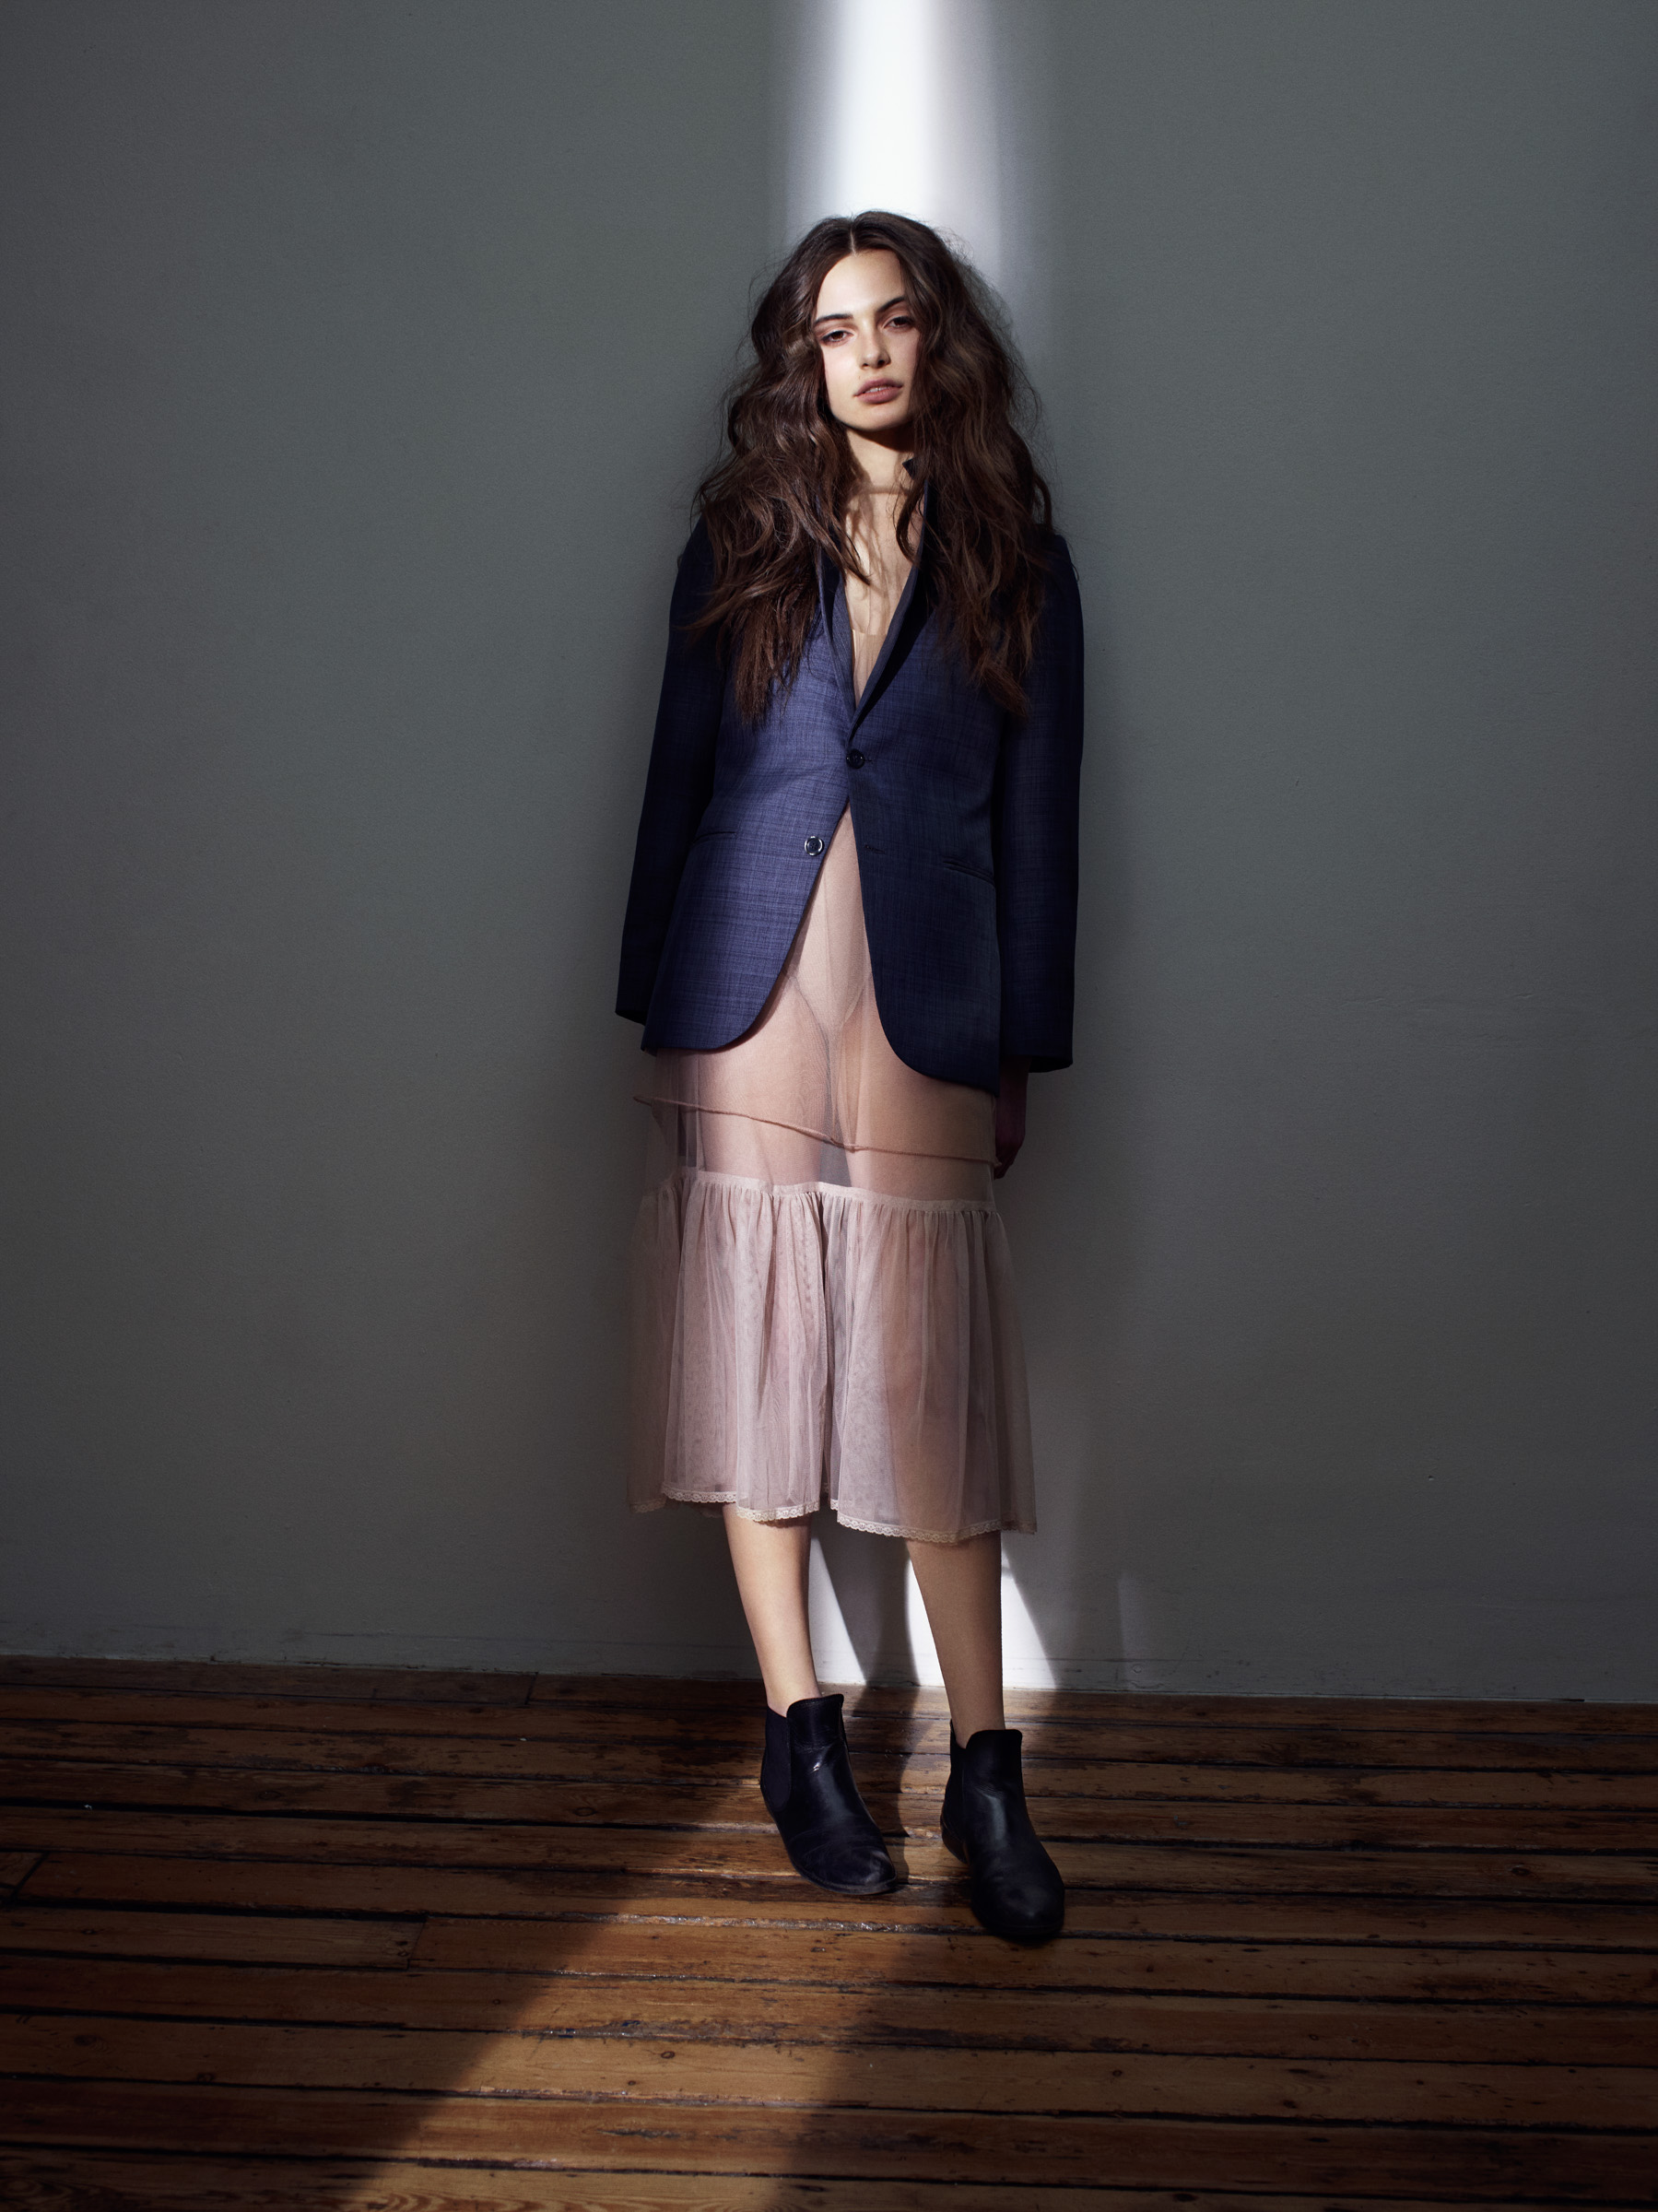 Jack_Eames_Fashion_Light_Shot_01.jpg